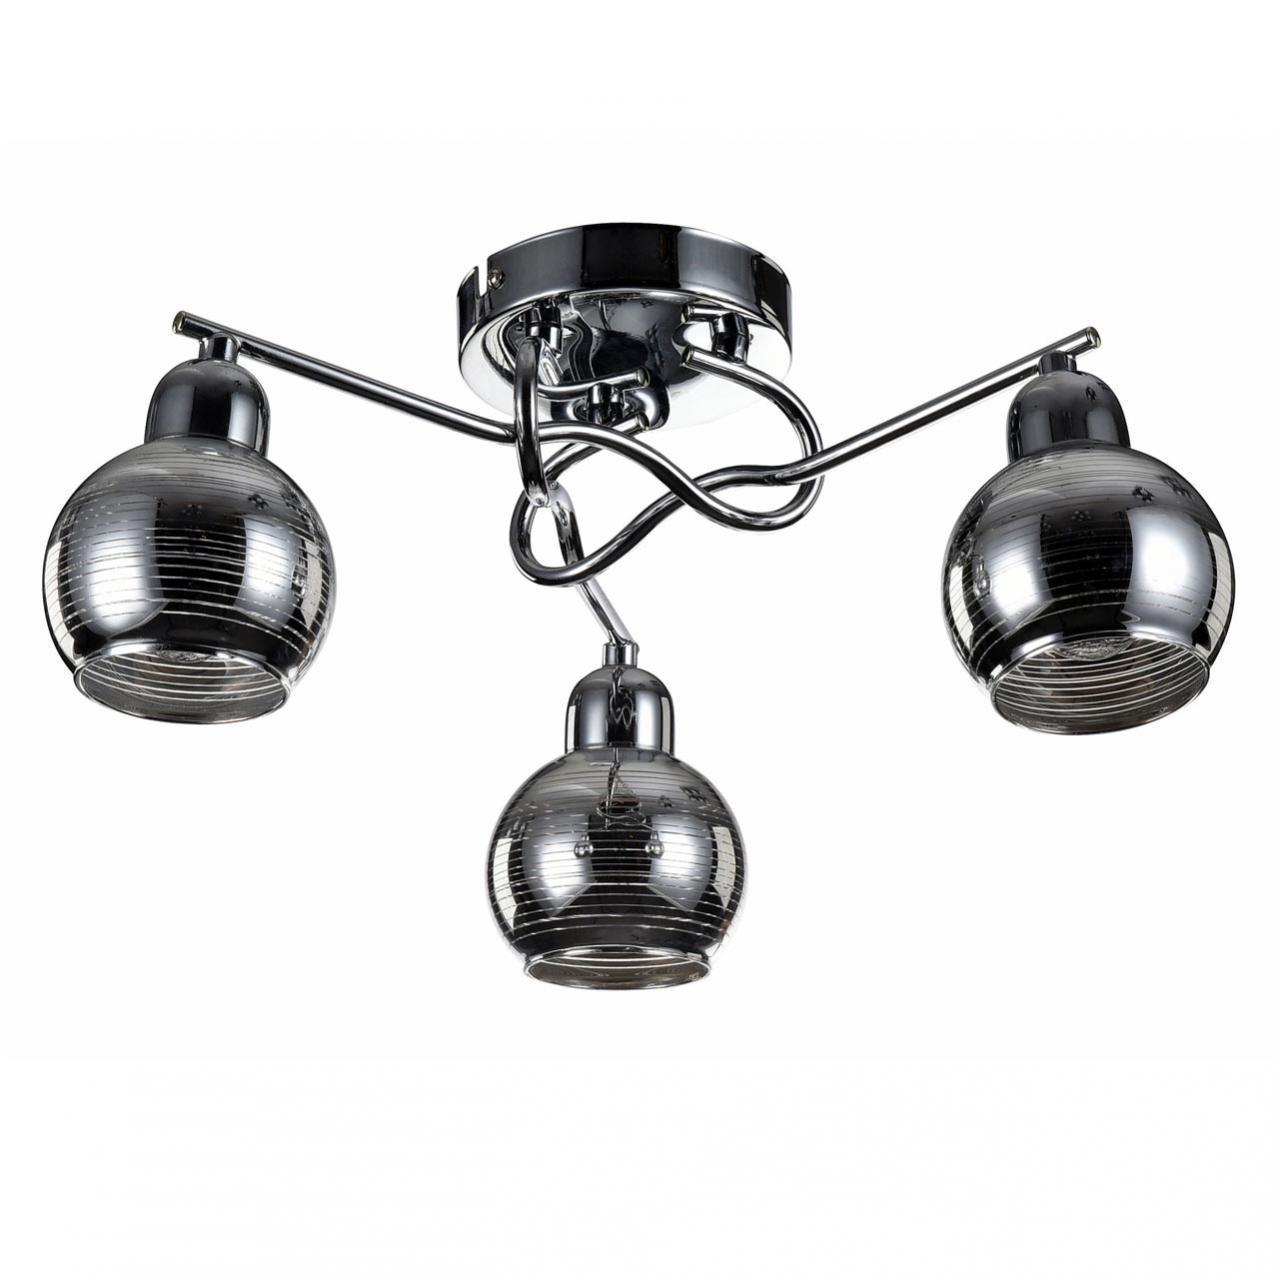 Люстра Freya Cosmo FR5102-CL-03-CH потолочная потолочная люстра freya fr5102 cl 06 ch